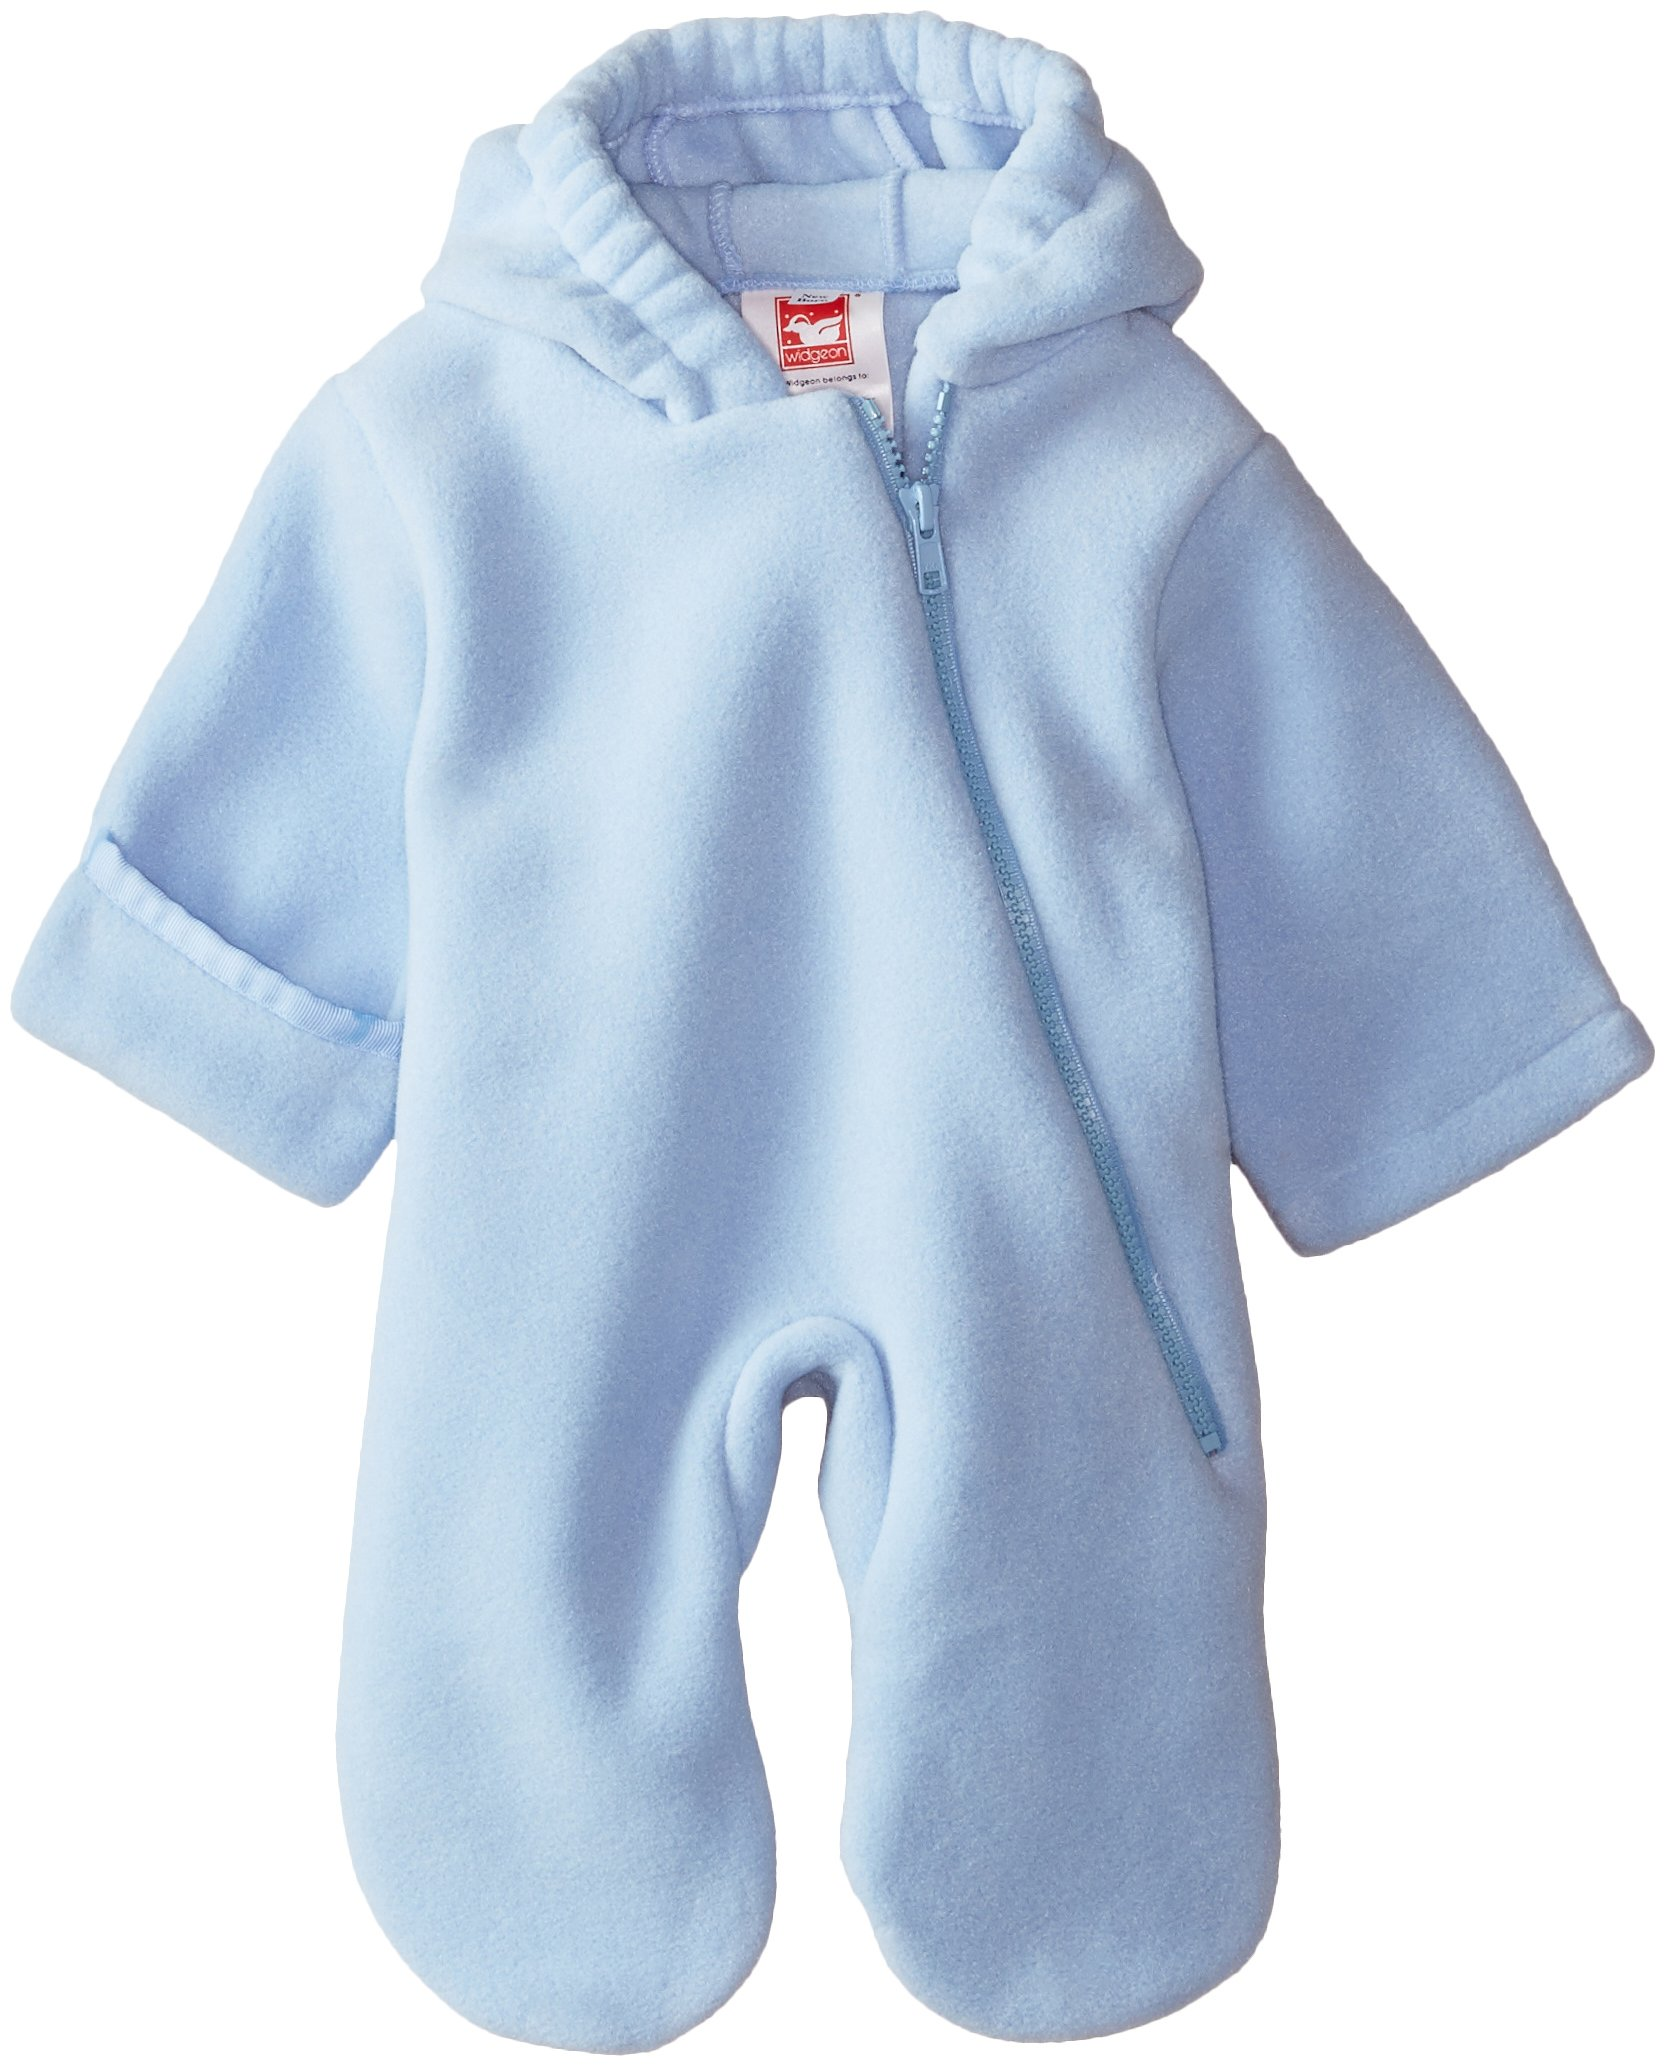 Widgeon Baby-Boys' Newborn Bunting, Light Blue, 6 Months